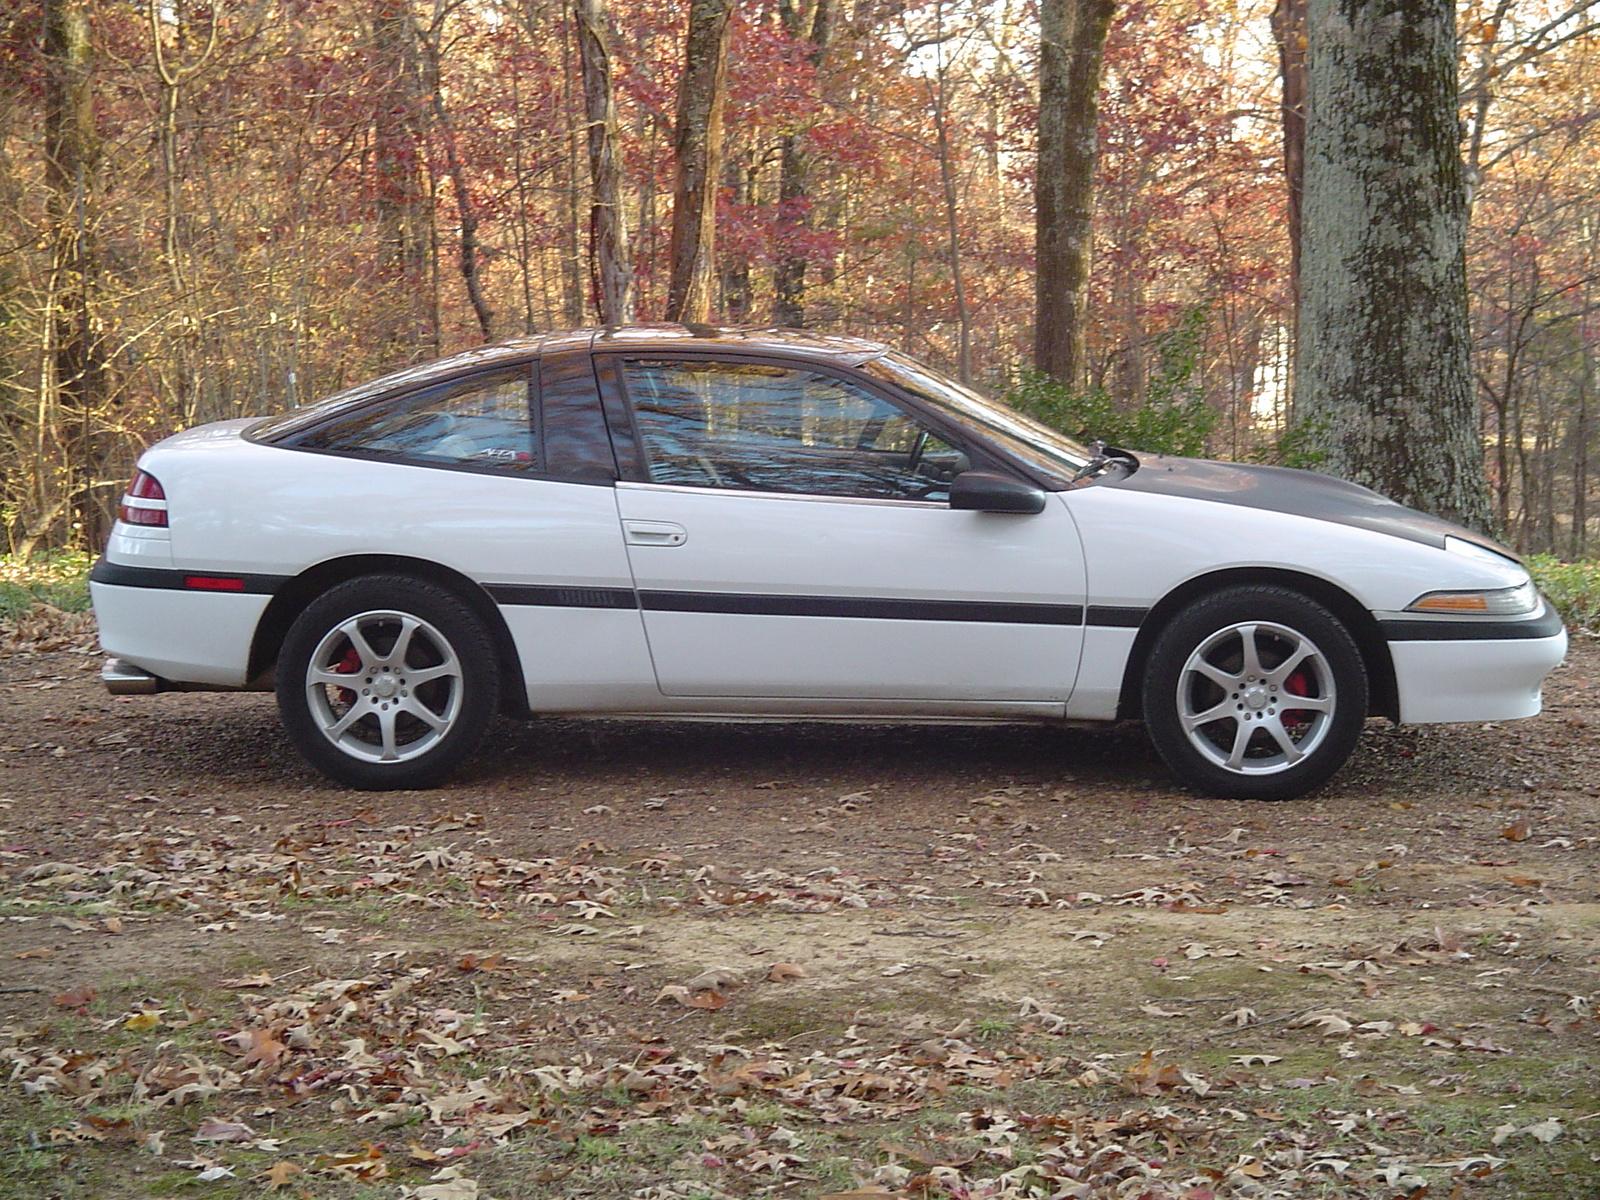 1990 Mitsubishi Eclipse - Pictures